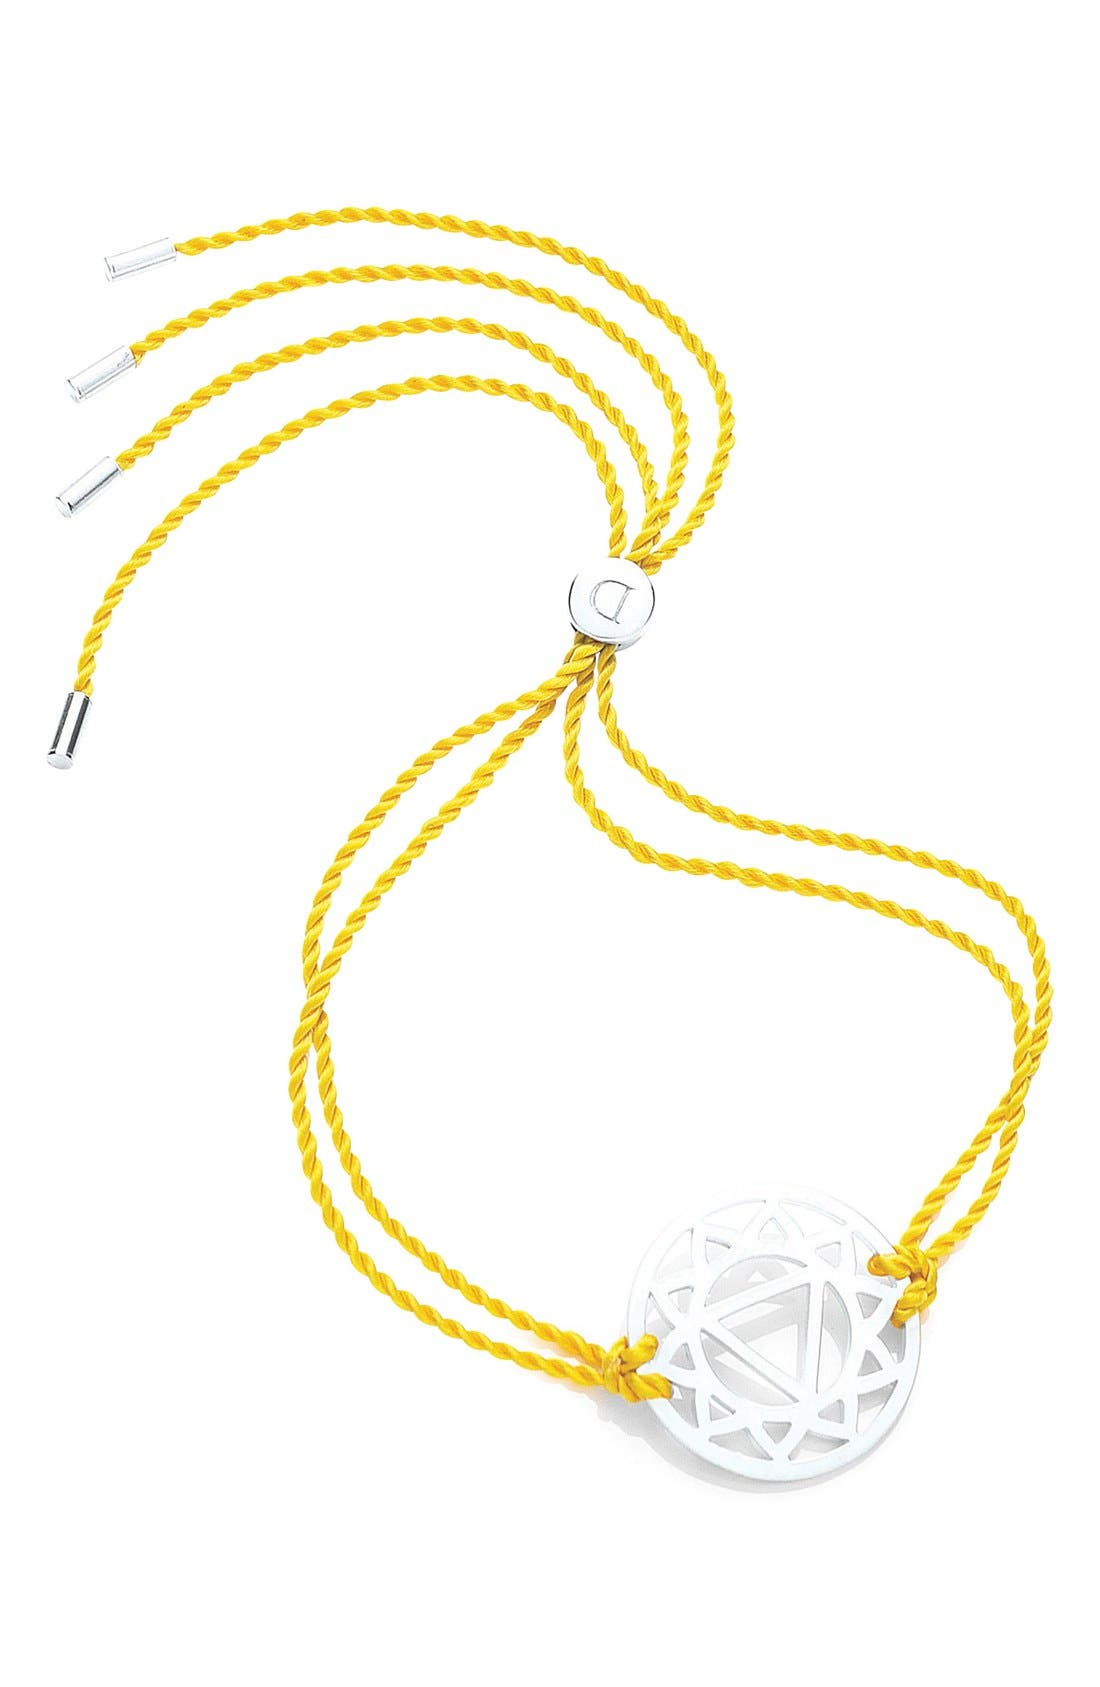 Main Image - Daisy London 'Solar Plexus Chakra' Cord Bracelet